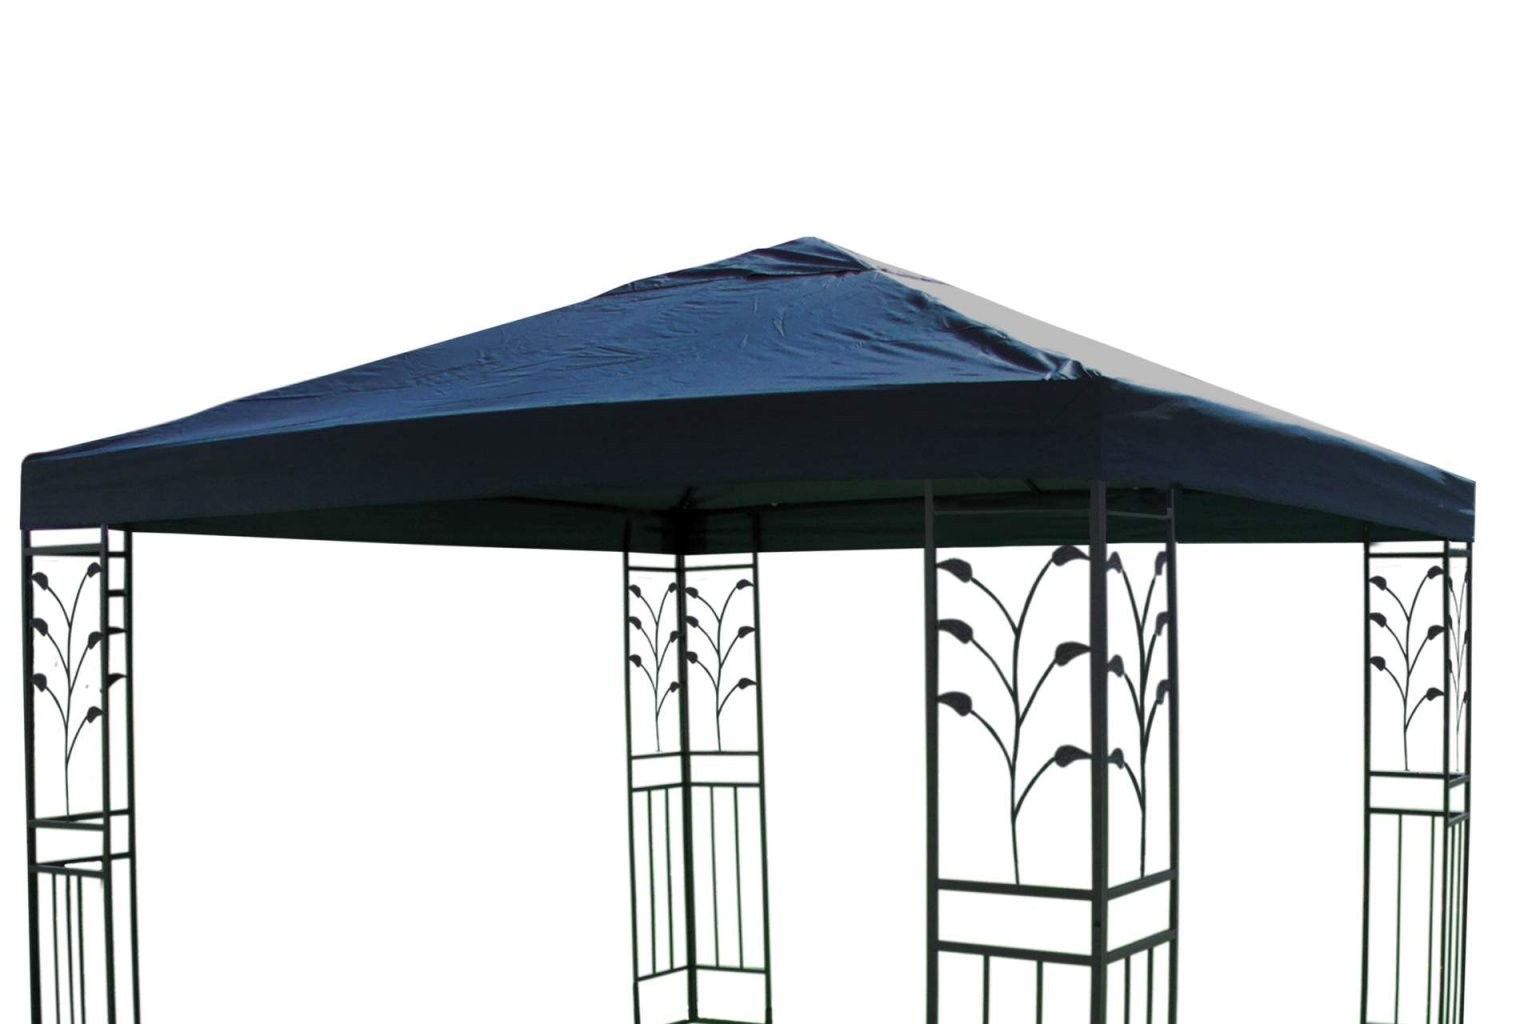 Pavillon Ersatzdach 3 X 3 M In Blau Dach Pavillon Pavillion  Kaufen von Ersatz Pavillon Dach 3X3 Bild